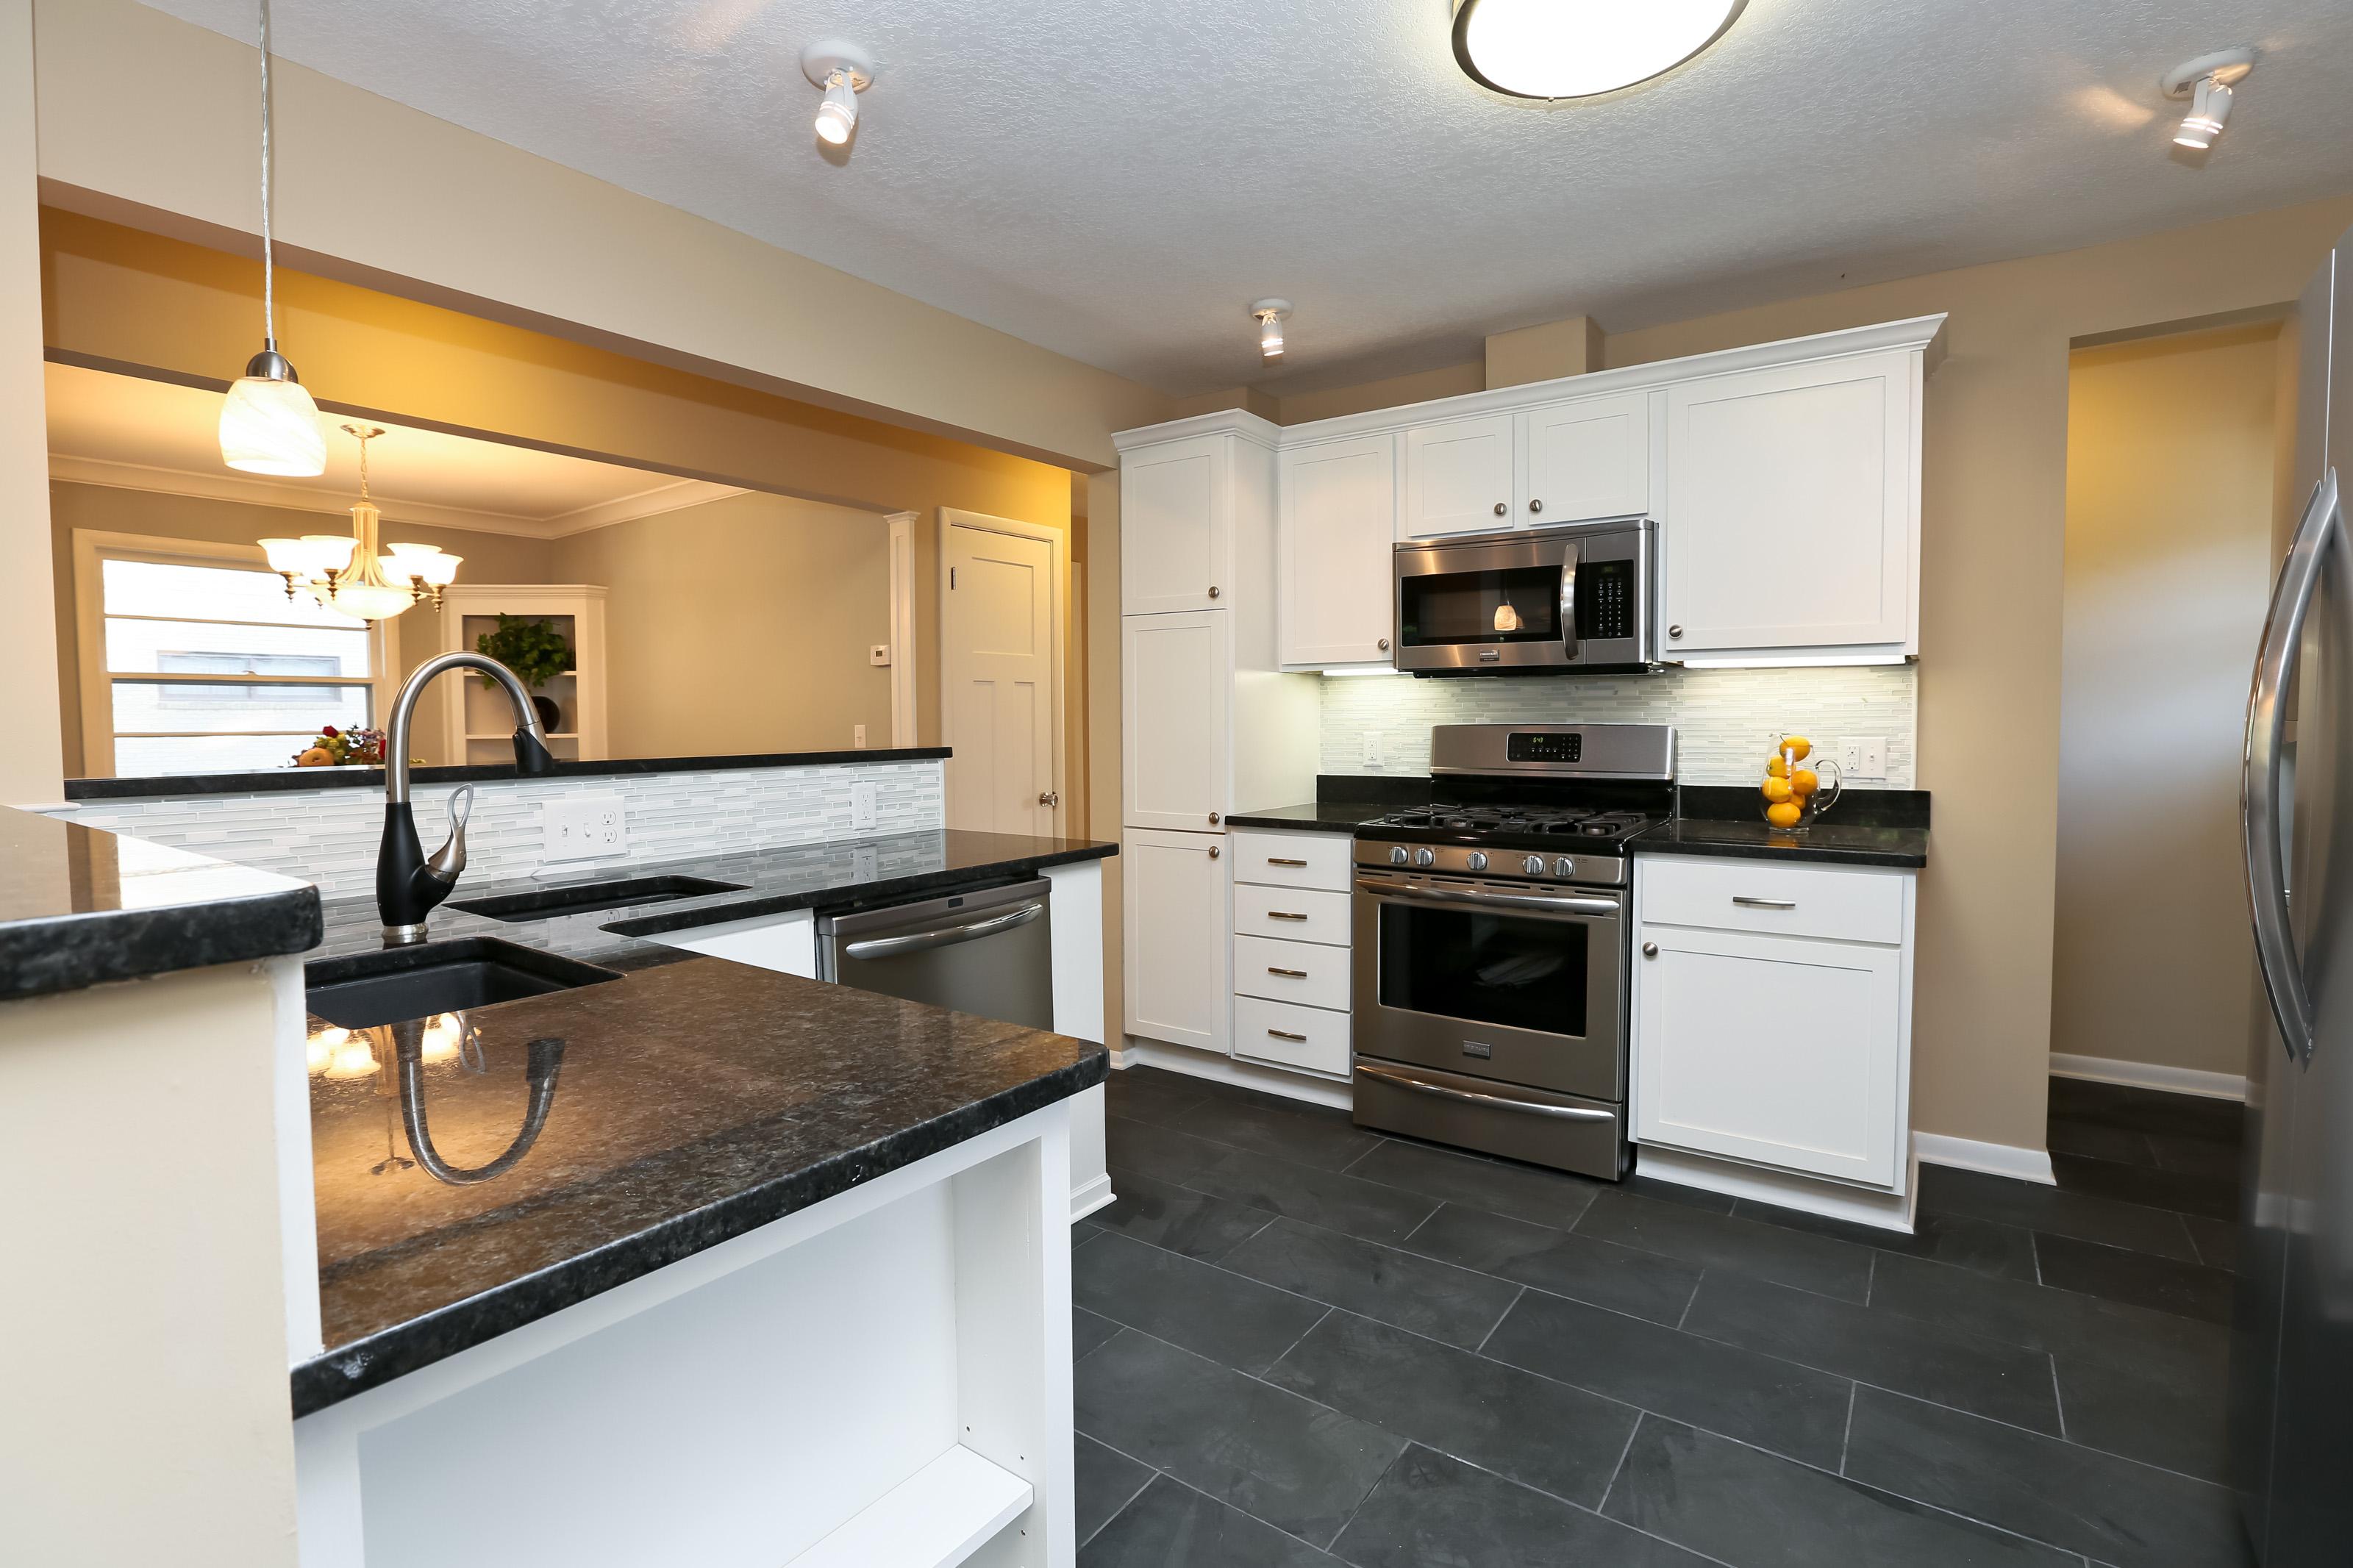 Bathroom Furniture Return On Investment Kitchen Remodel 2014 average remodeling costs and return on investment homesmsp